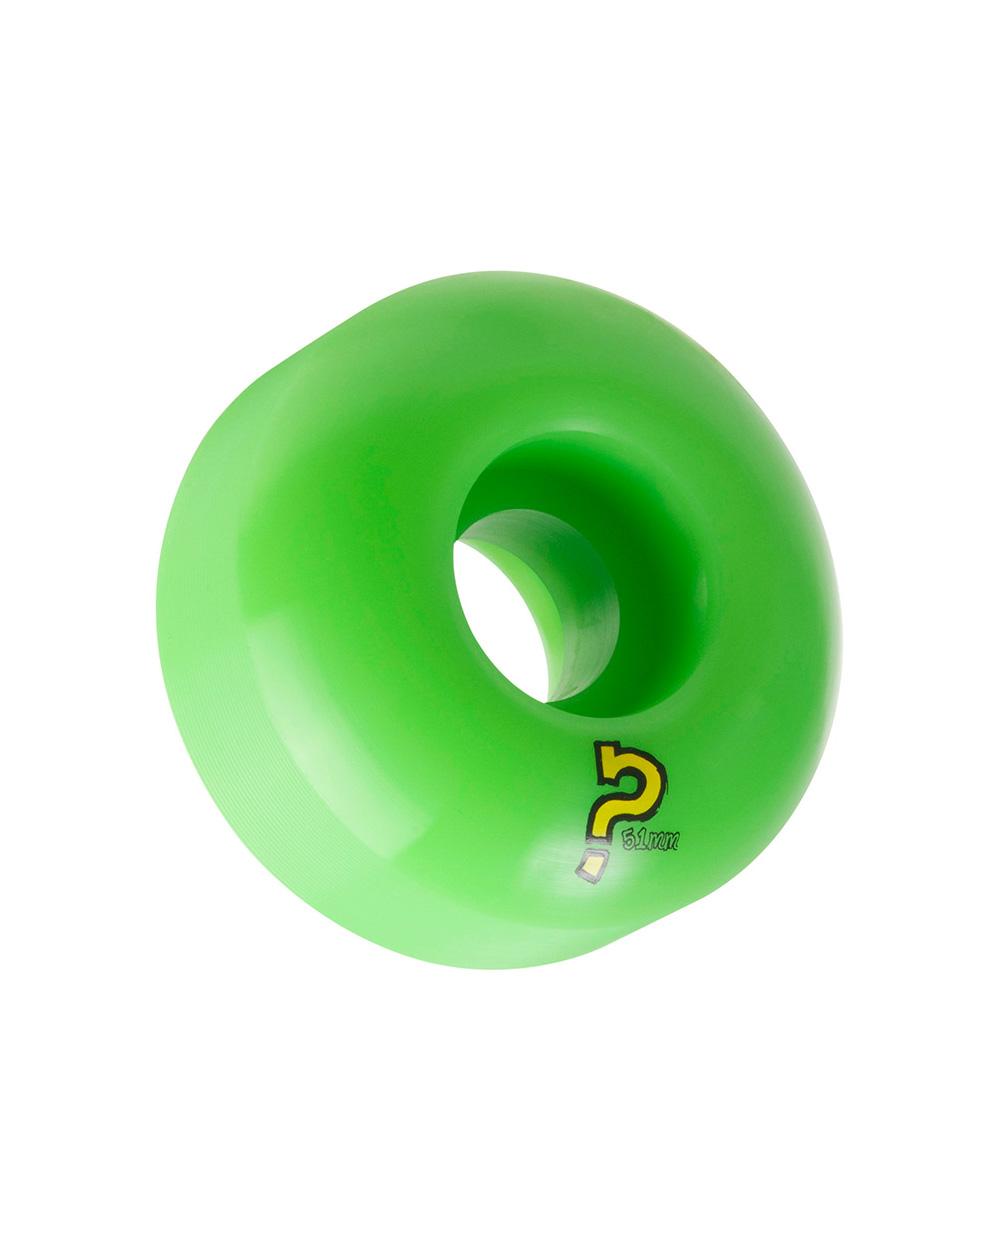 Enuff Refreshers 51mm Skateboard Wheels Green pack of 4